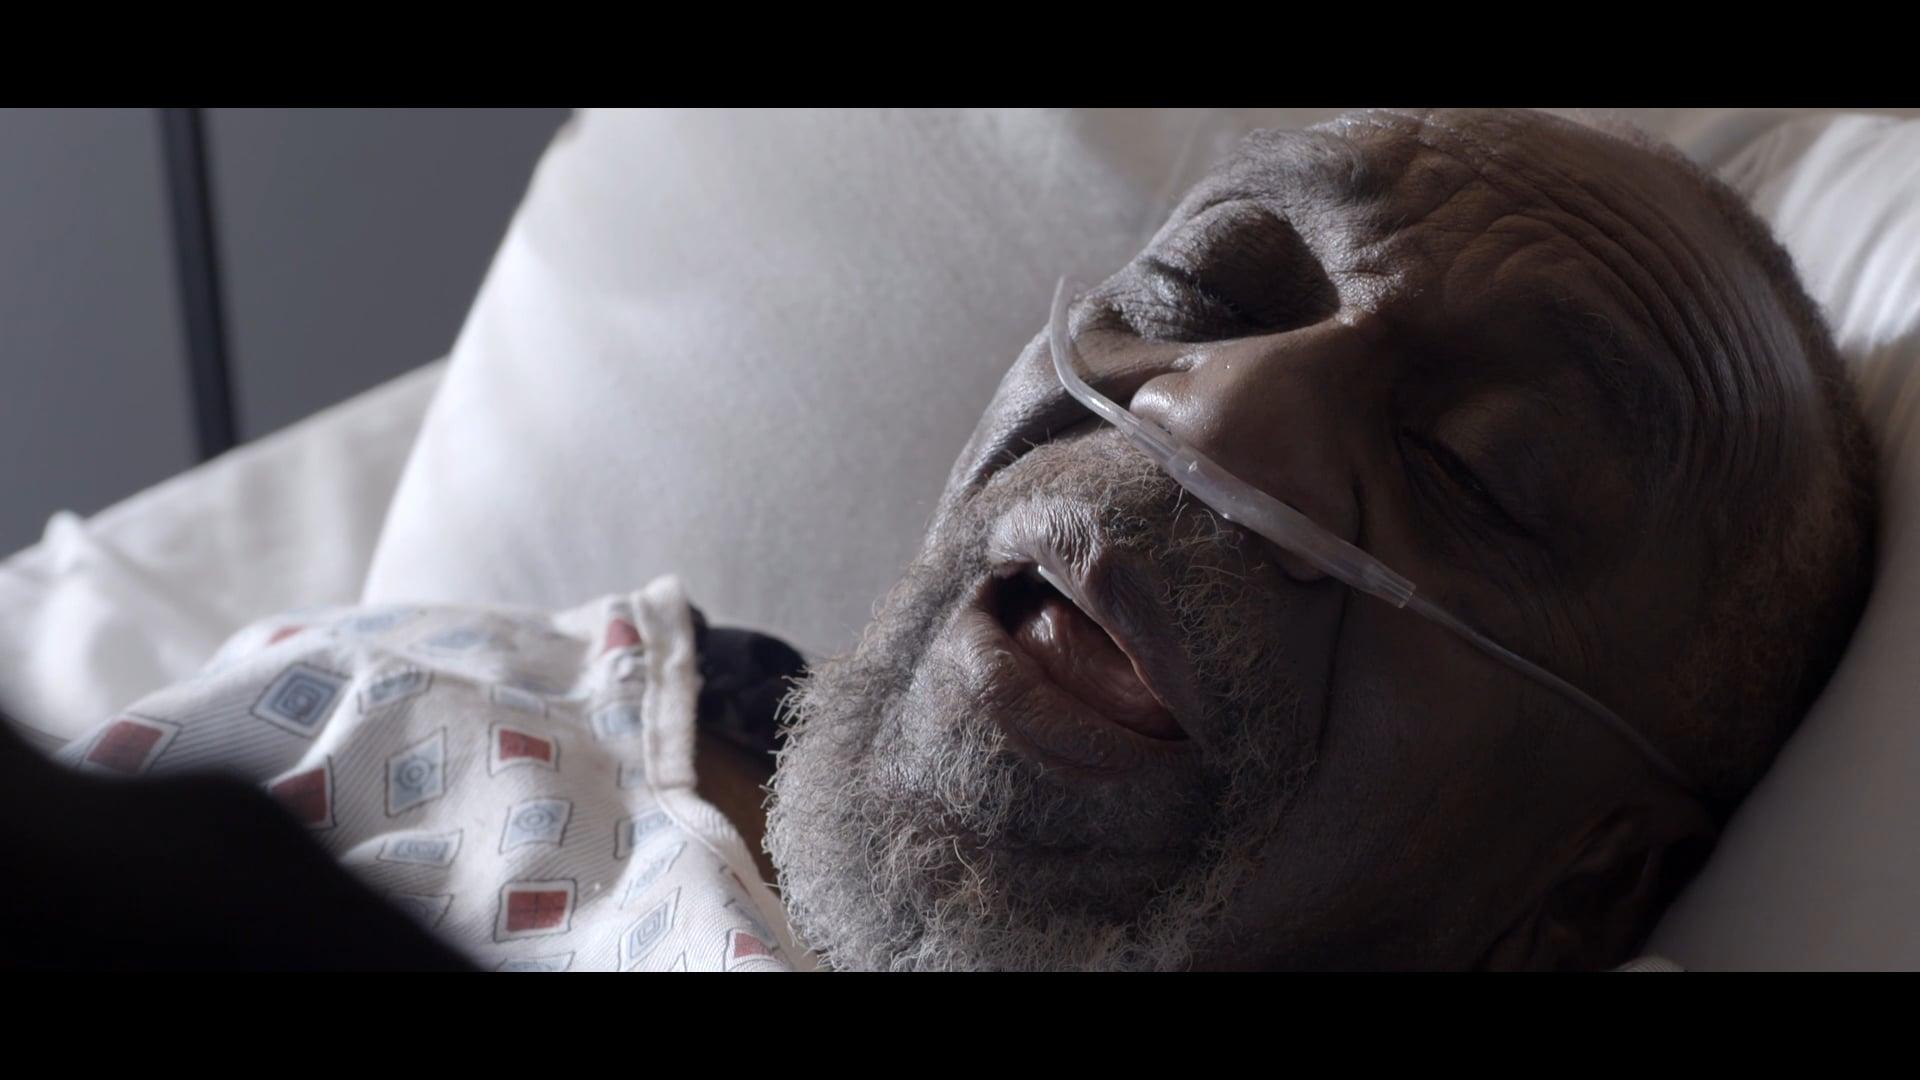 'Charlie' - Excerpt (Short Film)